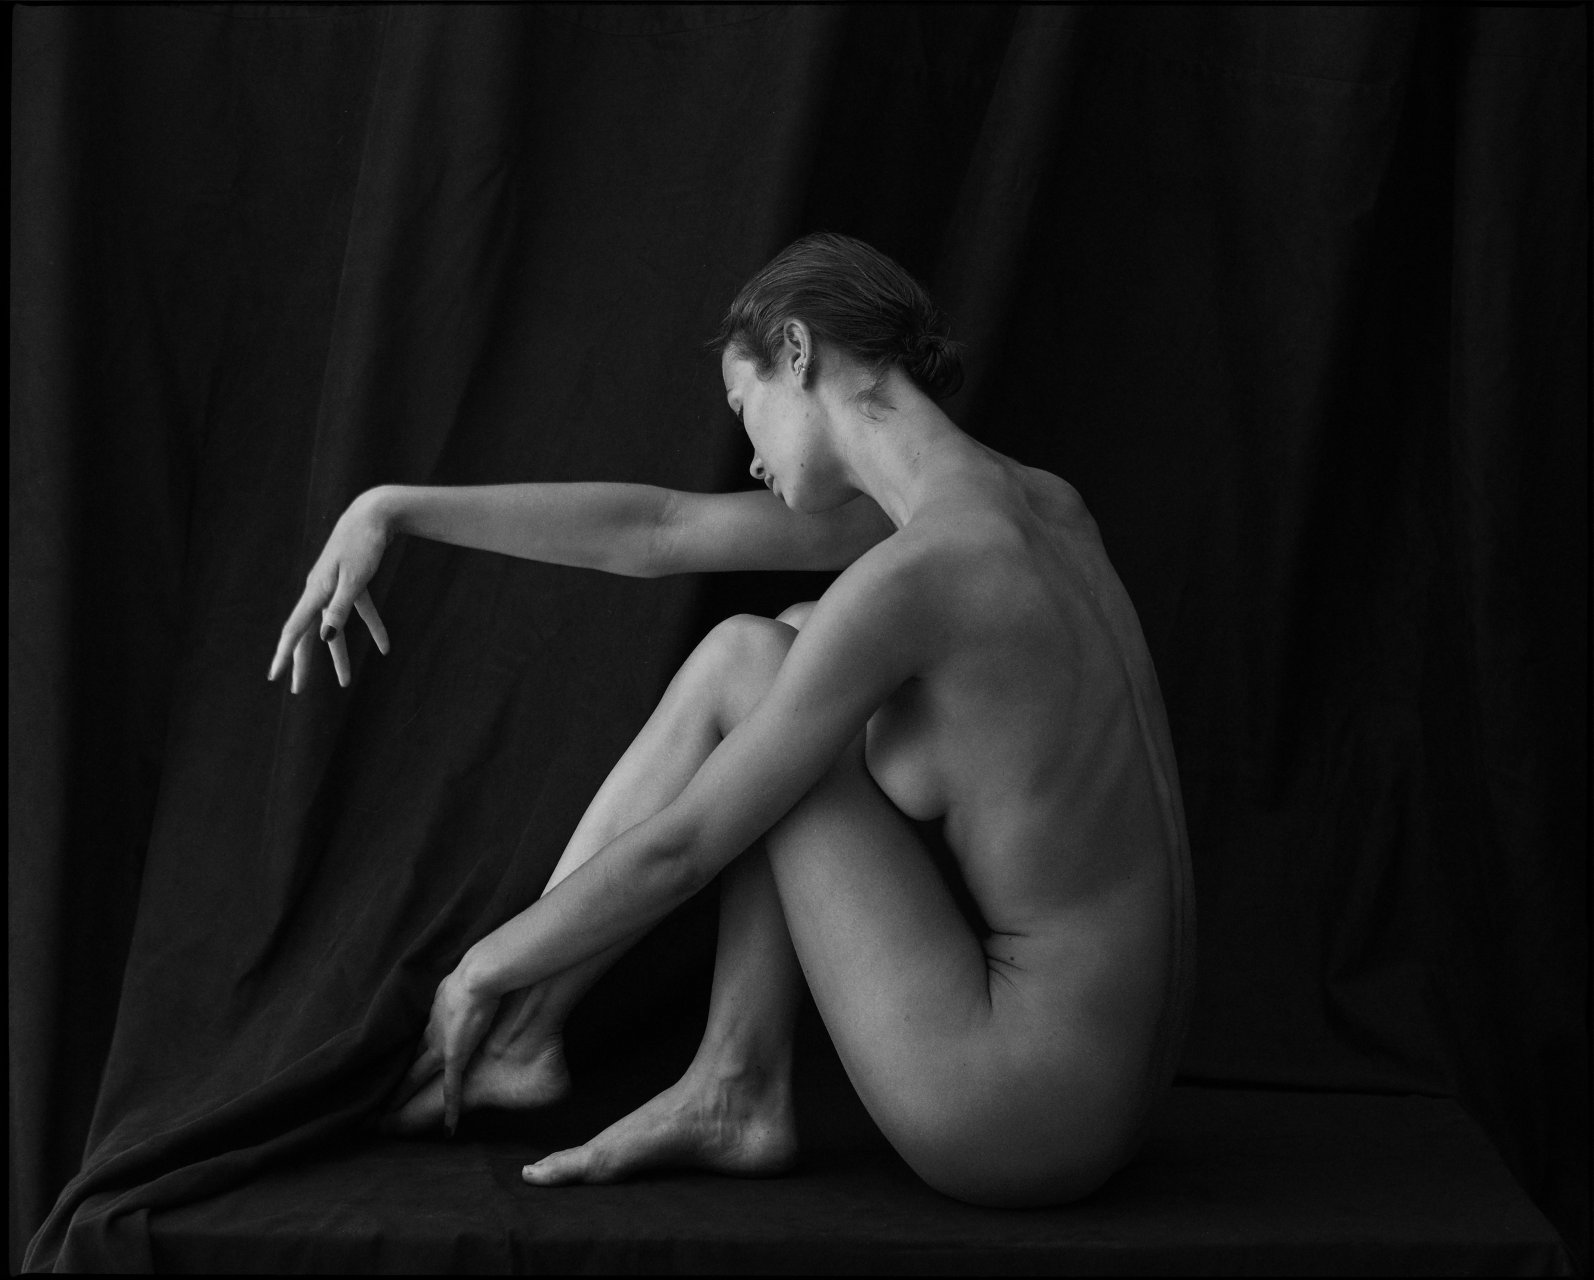 Ashley benson nude pics. 2018-2019 celebrityes photos leaks! new photo